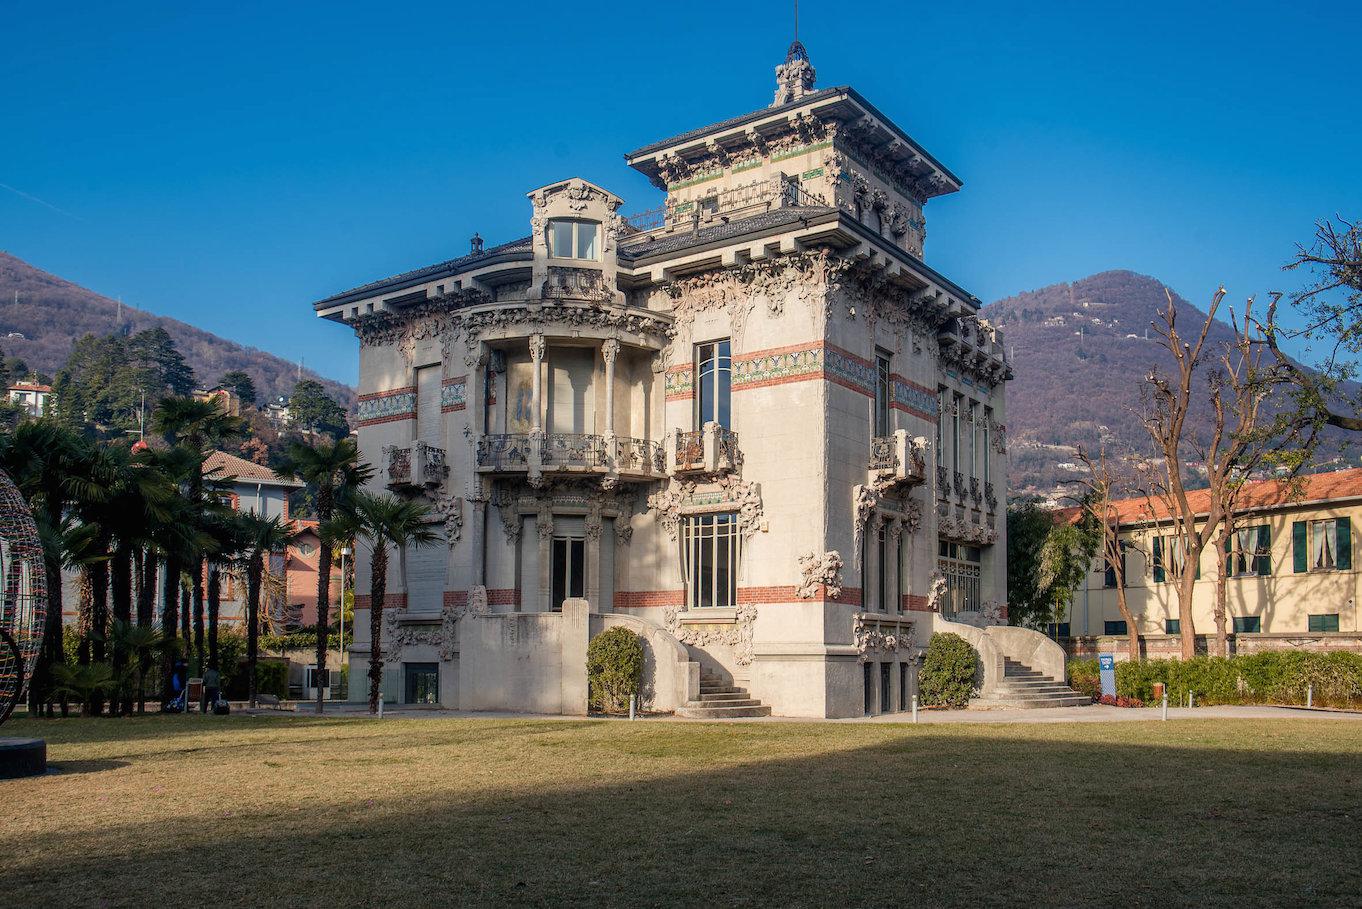 https://www.fattidistorie.it/wp-content/uploads/2018/12/fattidistorie_villa_bernasconi.jpg